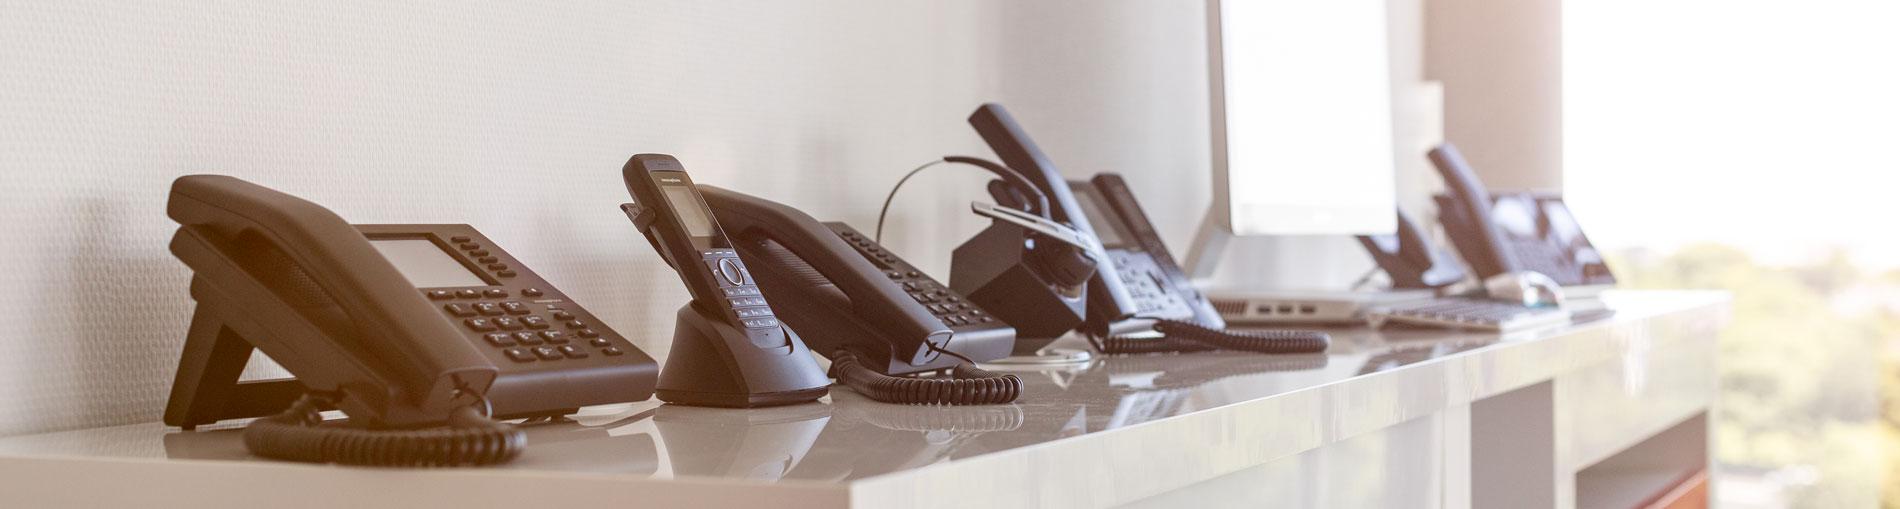 BREKOM Telephone Systems Header